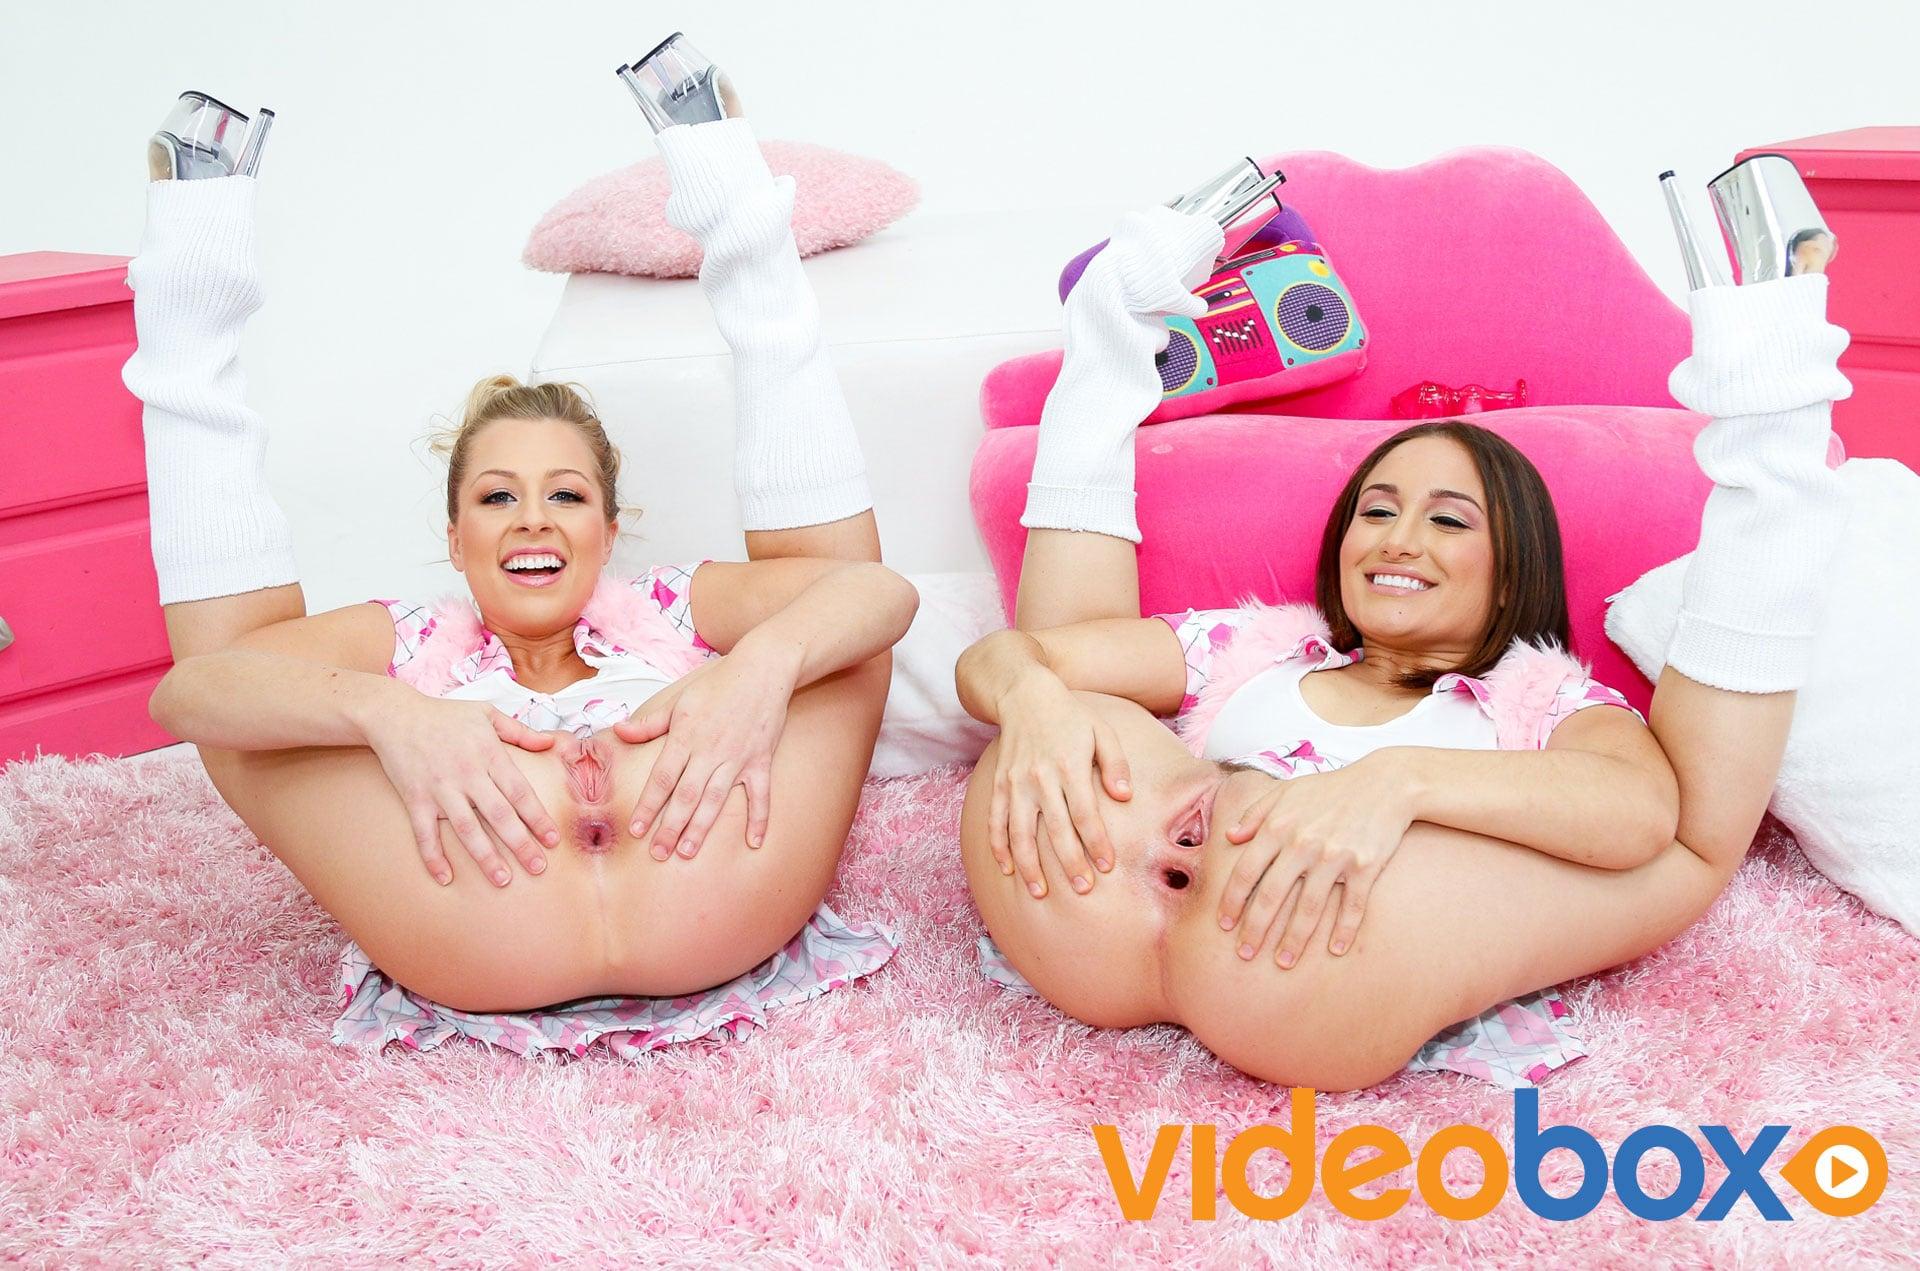 VideoBox 2 Cute Teens Pussys